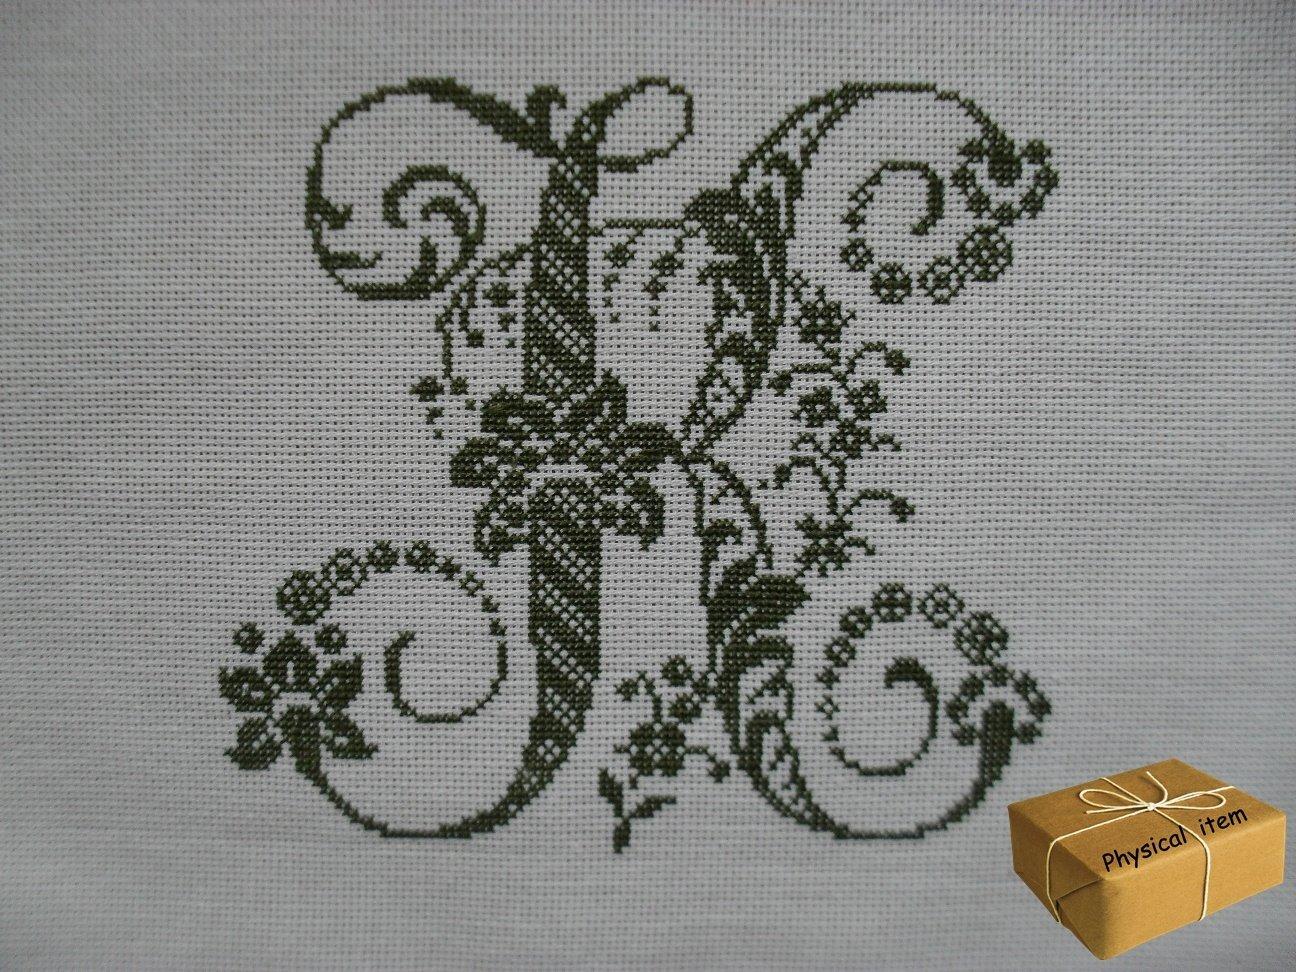 Antique Letter K Monogram. Handmade Embroidery. FINISHED